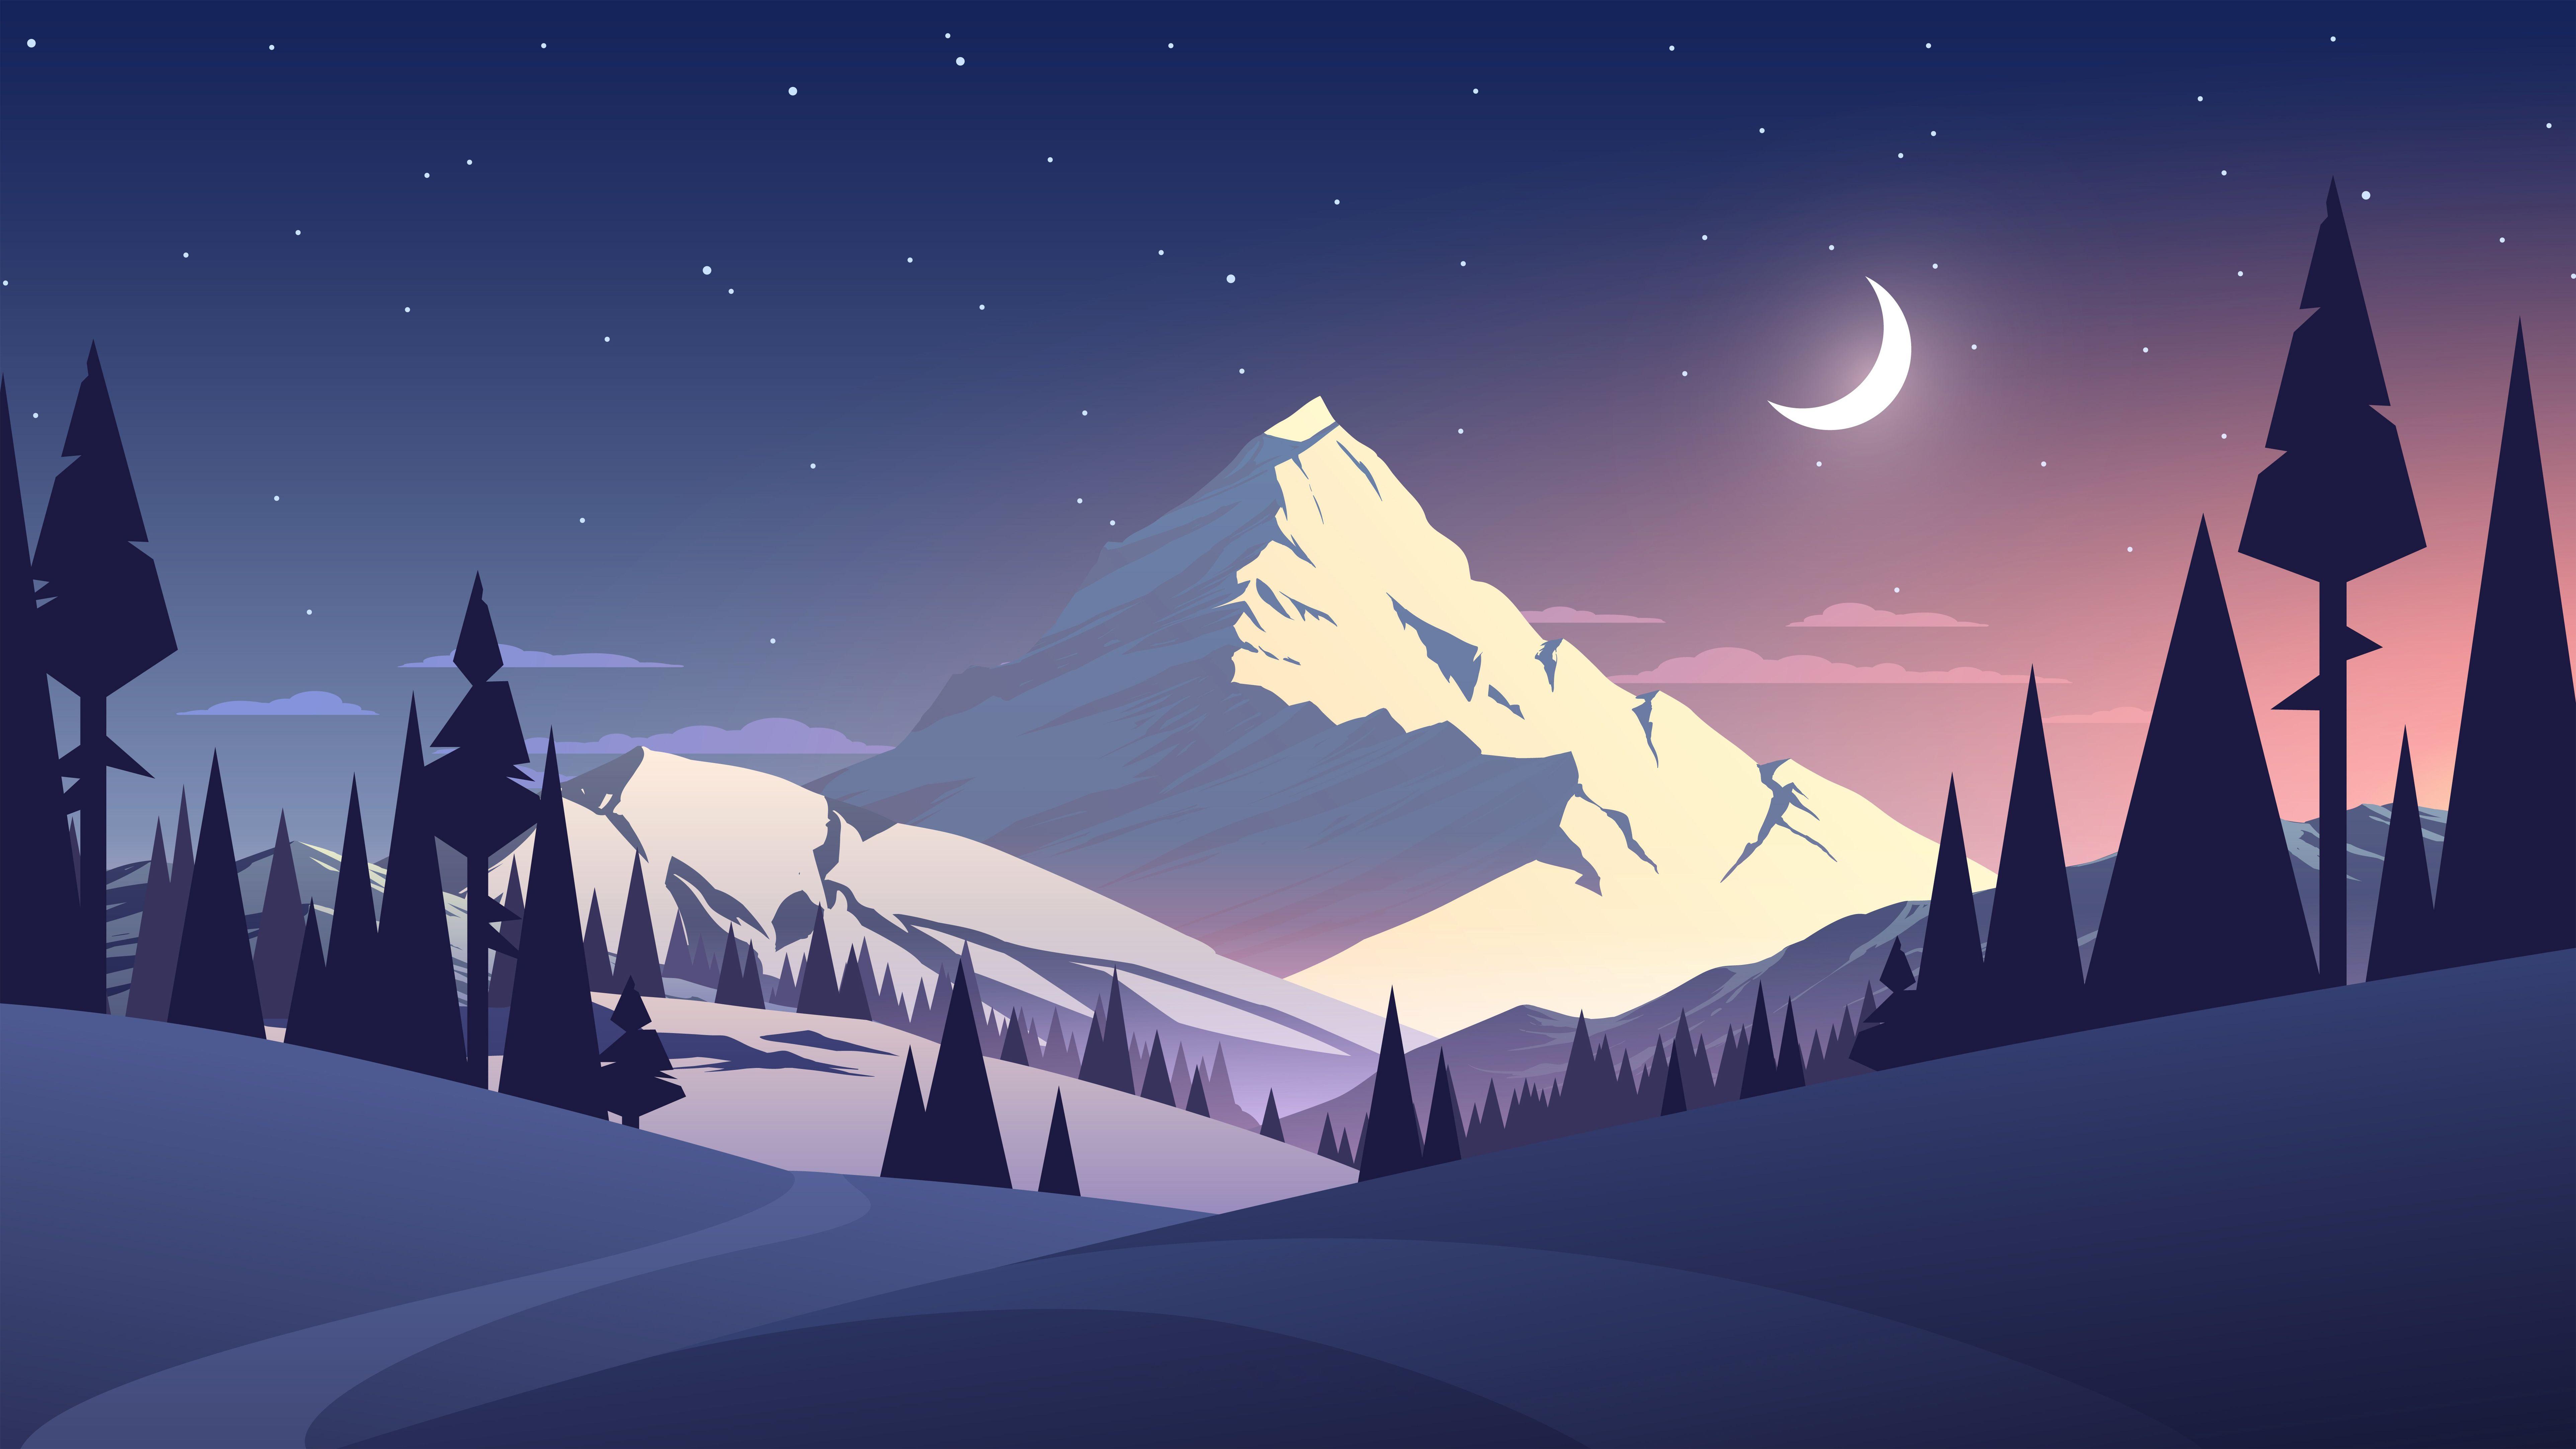 Night Illustration HD Wallpapers   Top Night Illustration HD 7698x4330